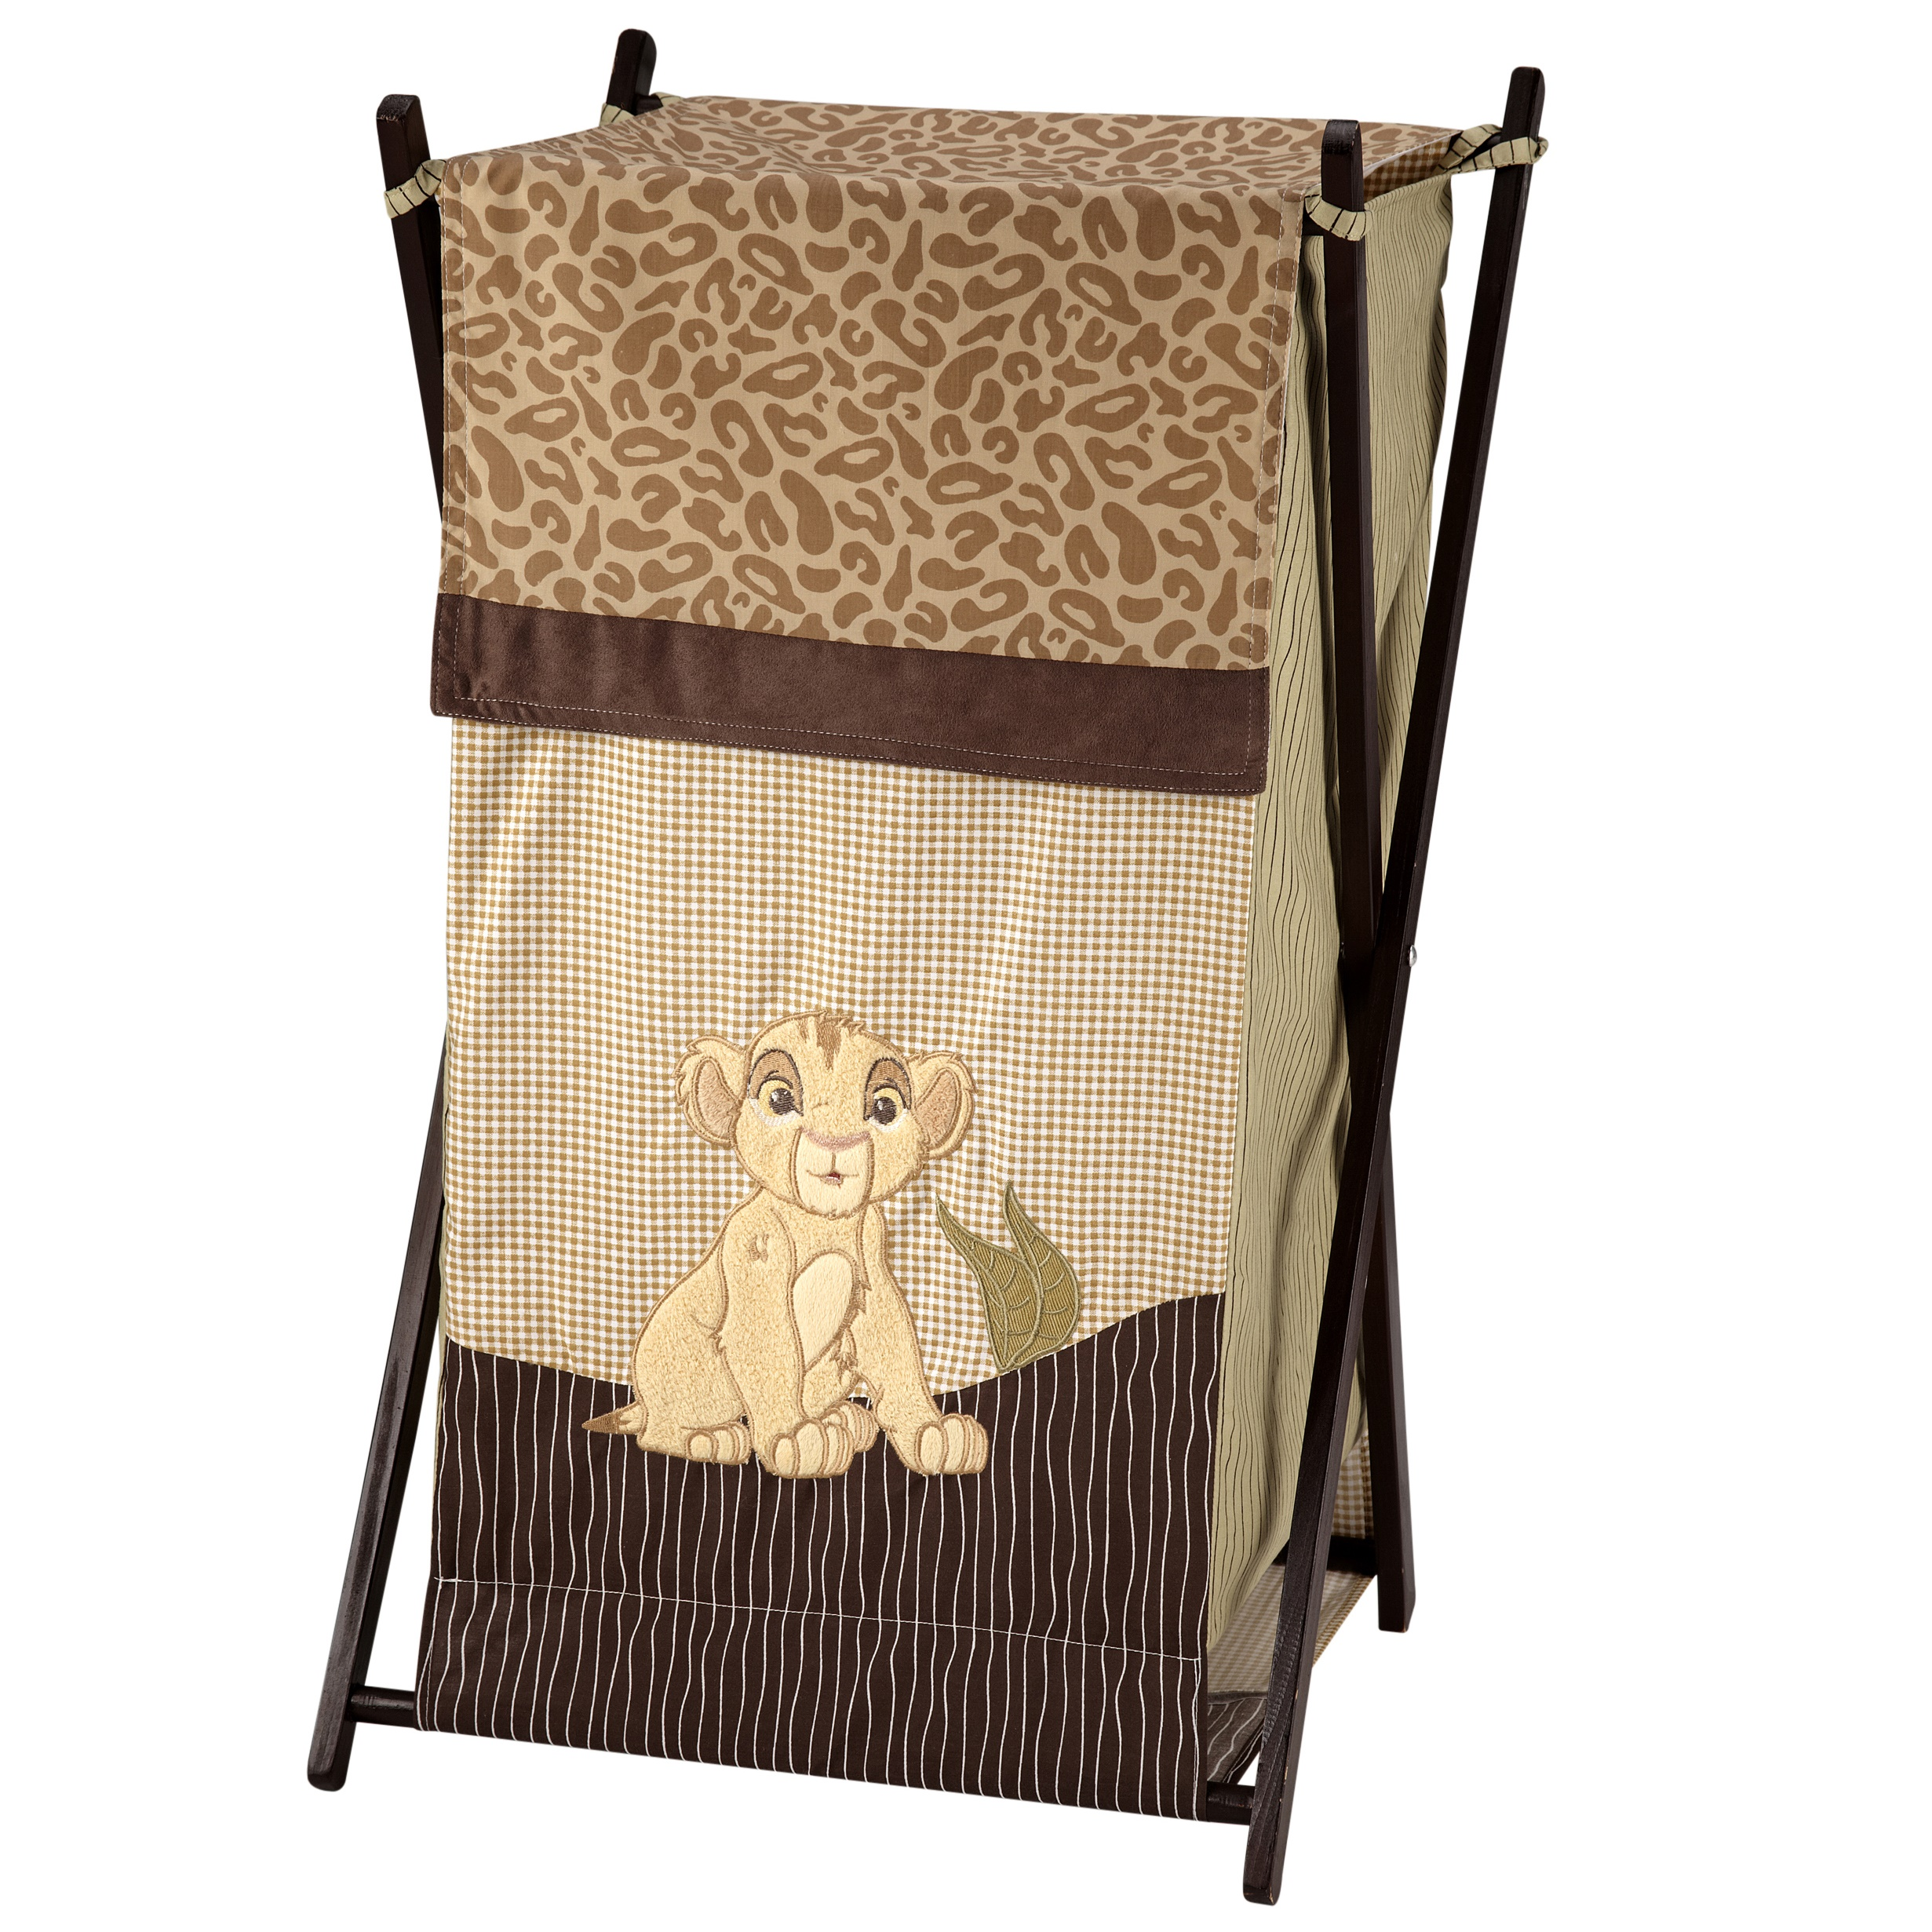 Disney Lion King Simba's Wild Adventure Appliqued Folding Hamper with Mesh Bag